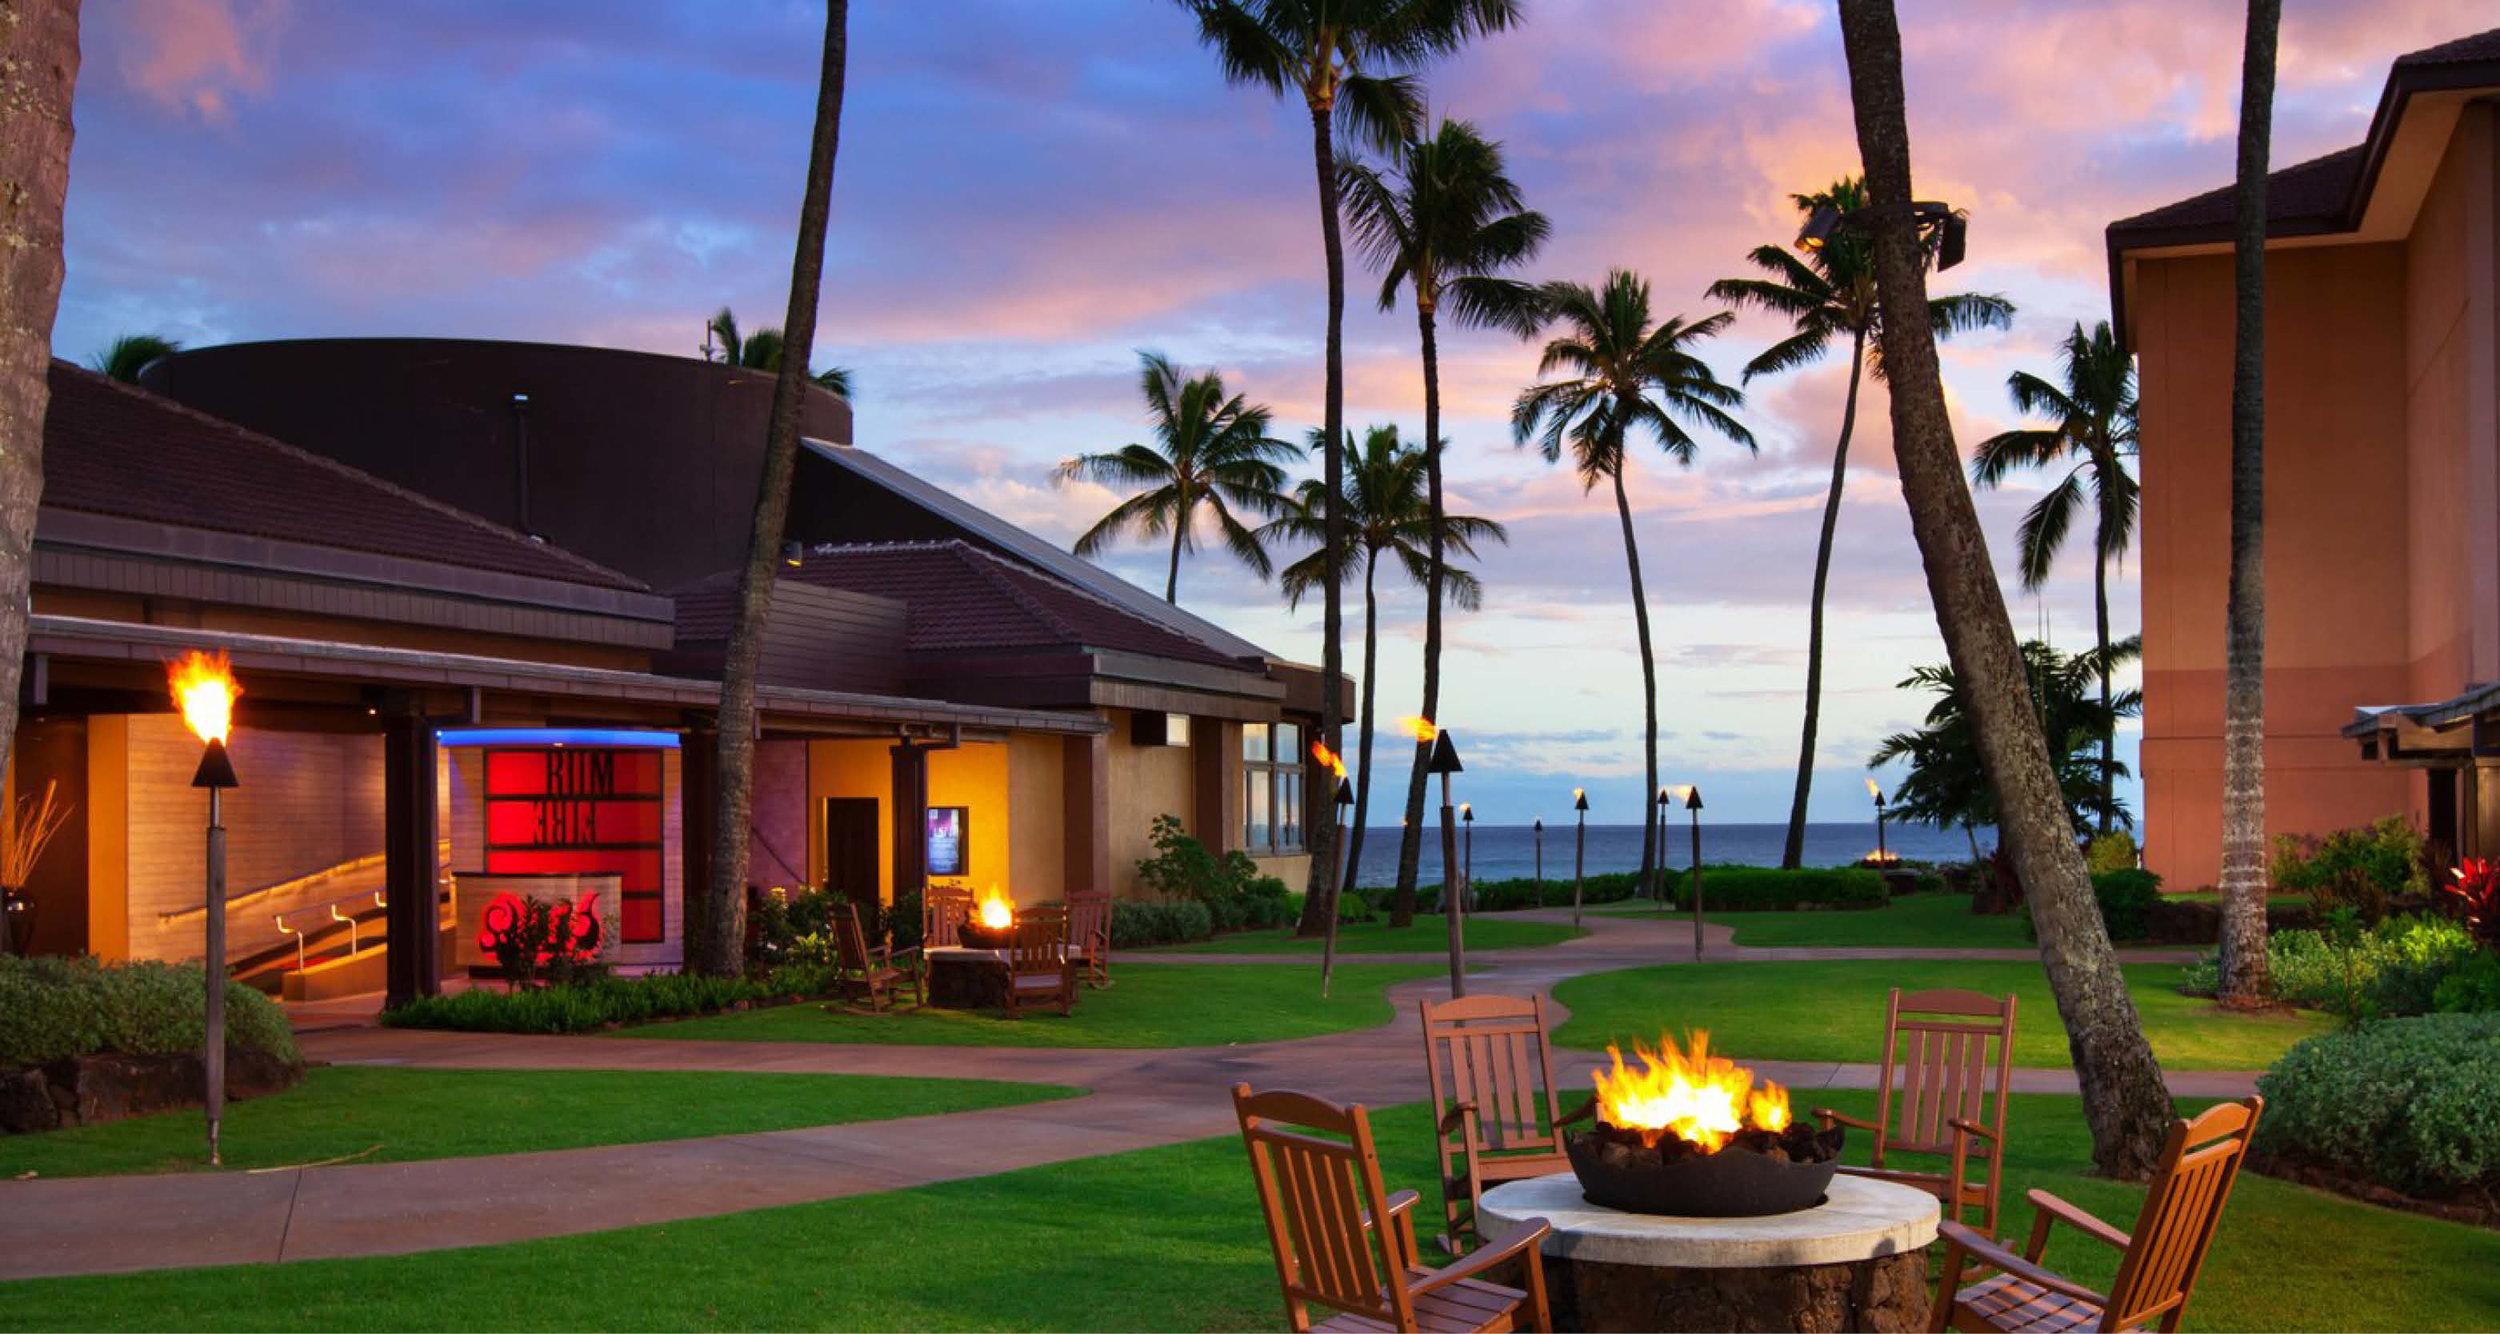 Dream-Maker-Travel-Accom-Hawaii-Sheraton-Garden.jpg